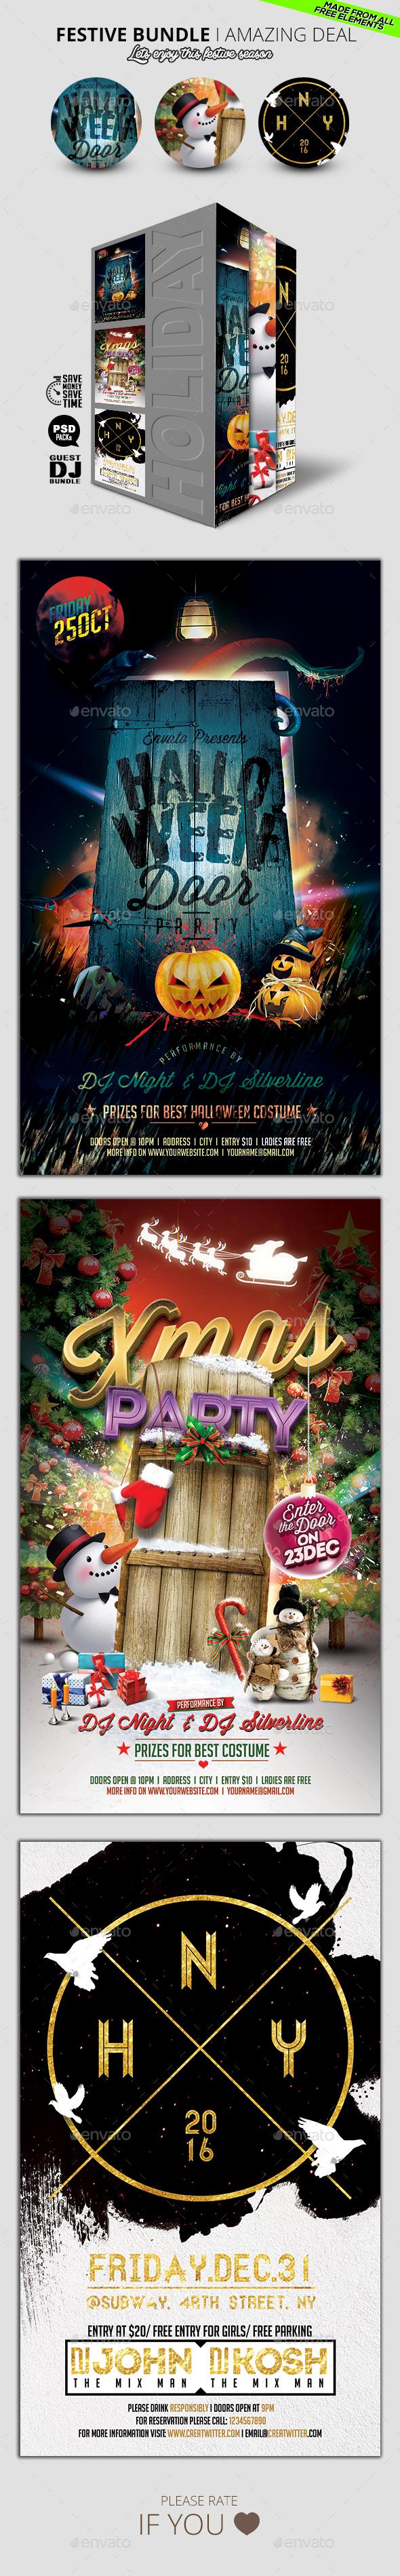 Festive Flyer Bundle V2 - Holidays Events